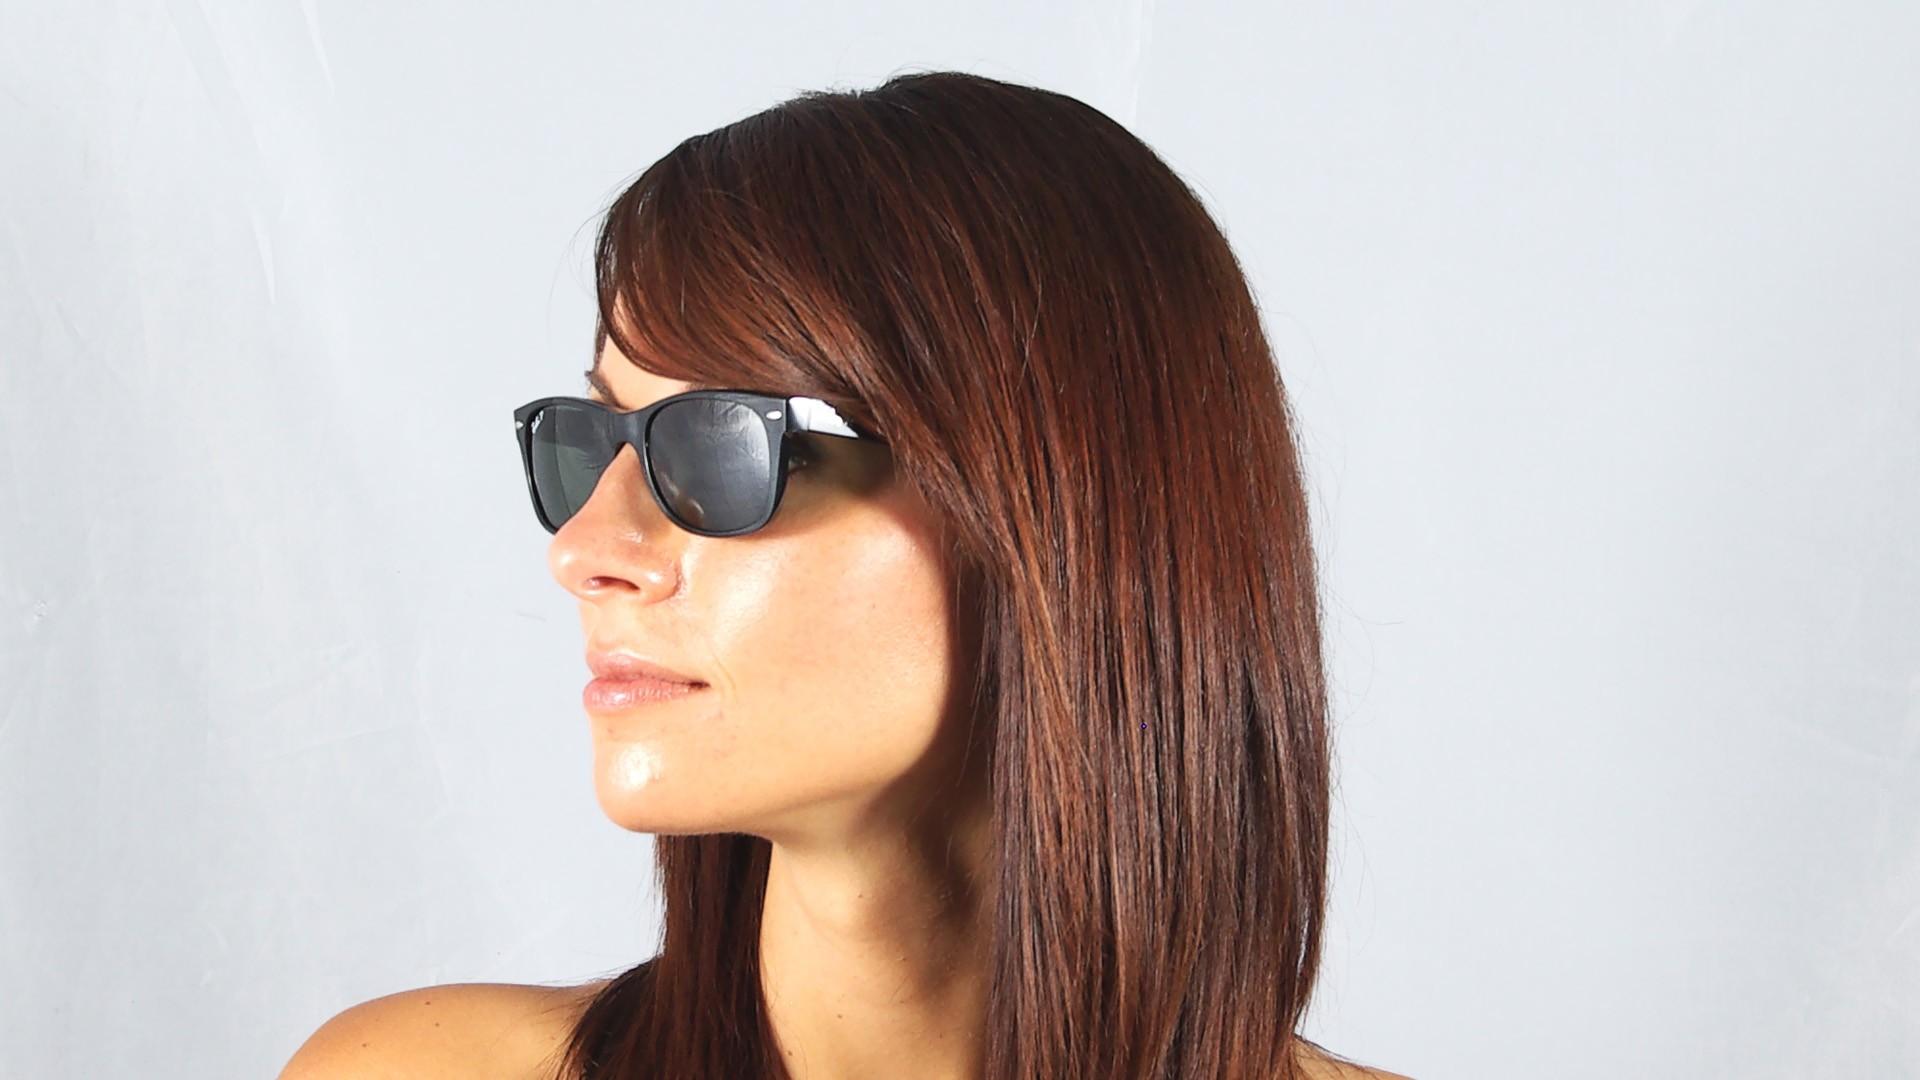 Sunglasses Ray-Ban New Wayfarer Black G15 RB2132 901 58 52-18 Medium  Polarized ca3980a003